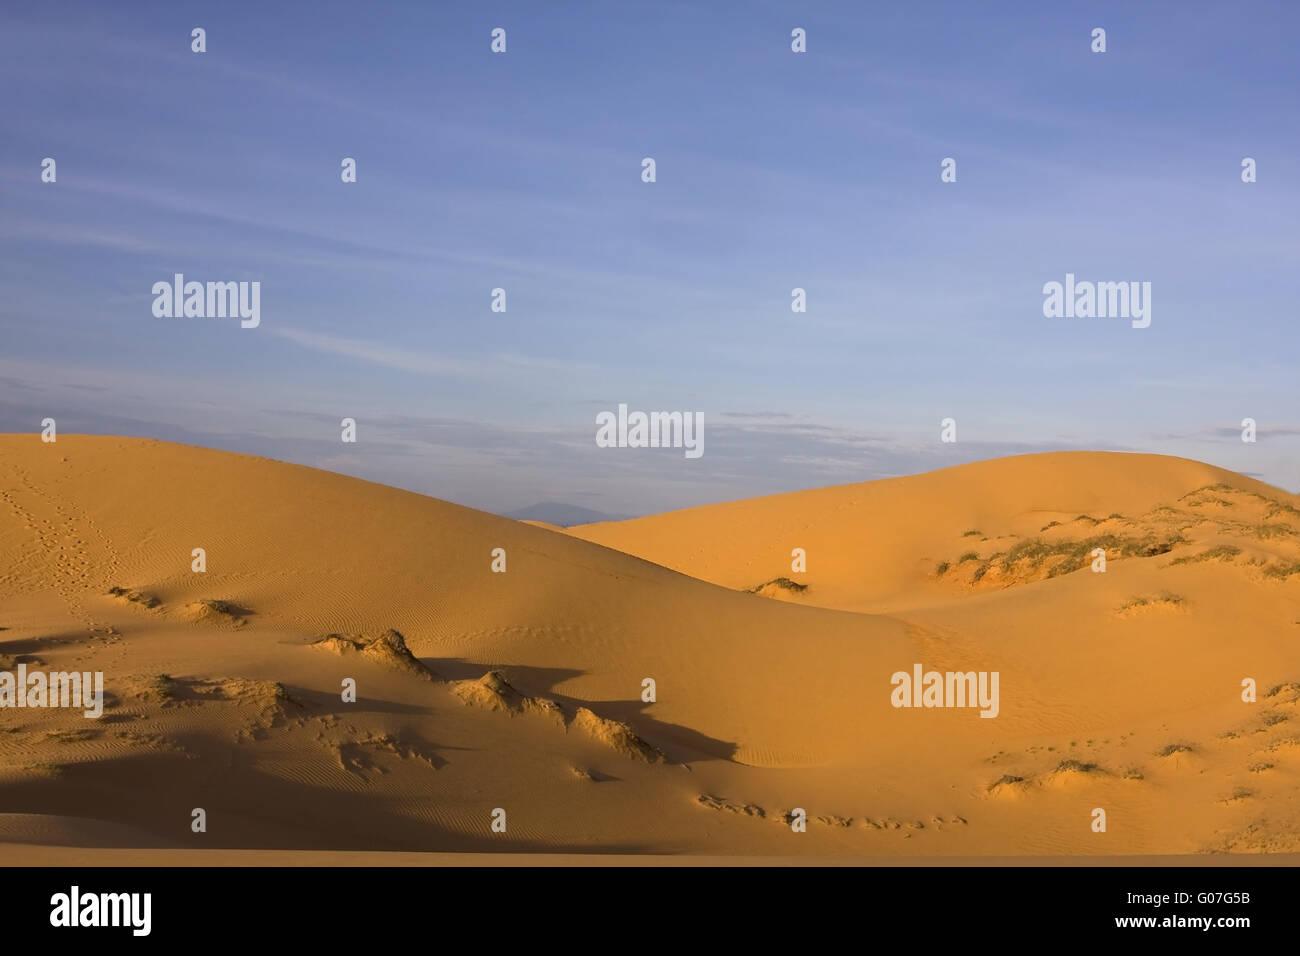 The Red Sand Dunes near Mui Ne,SouthVietnam,Southe - Stock Image